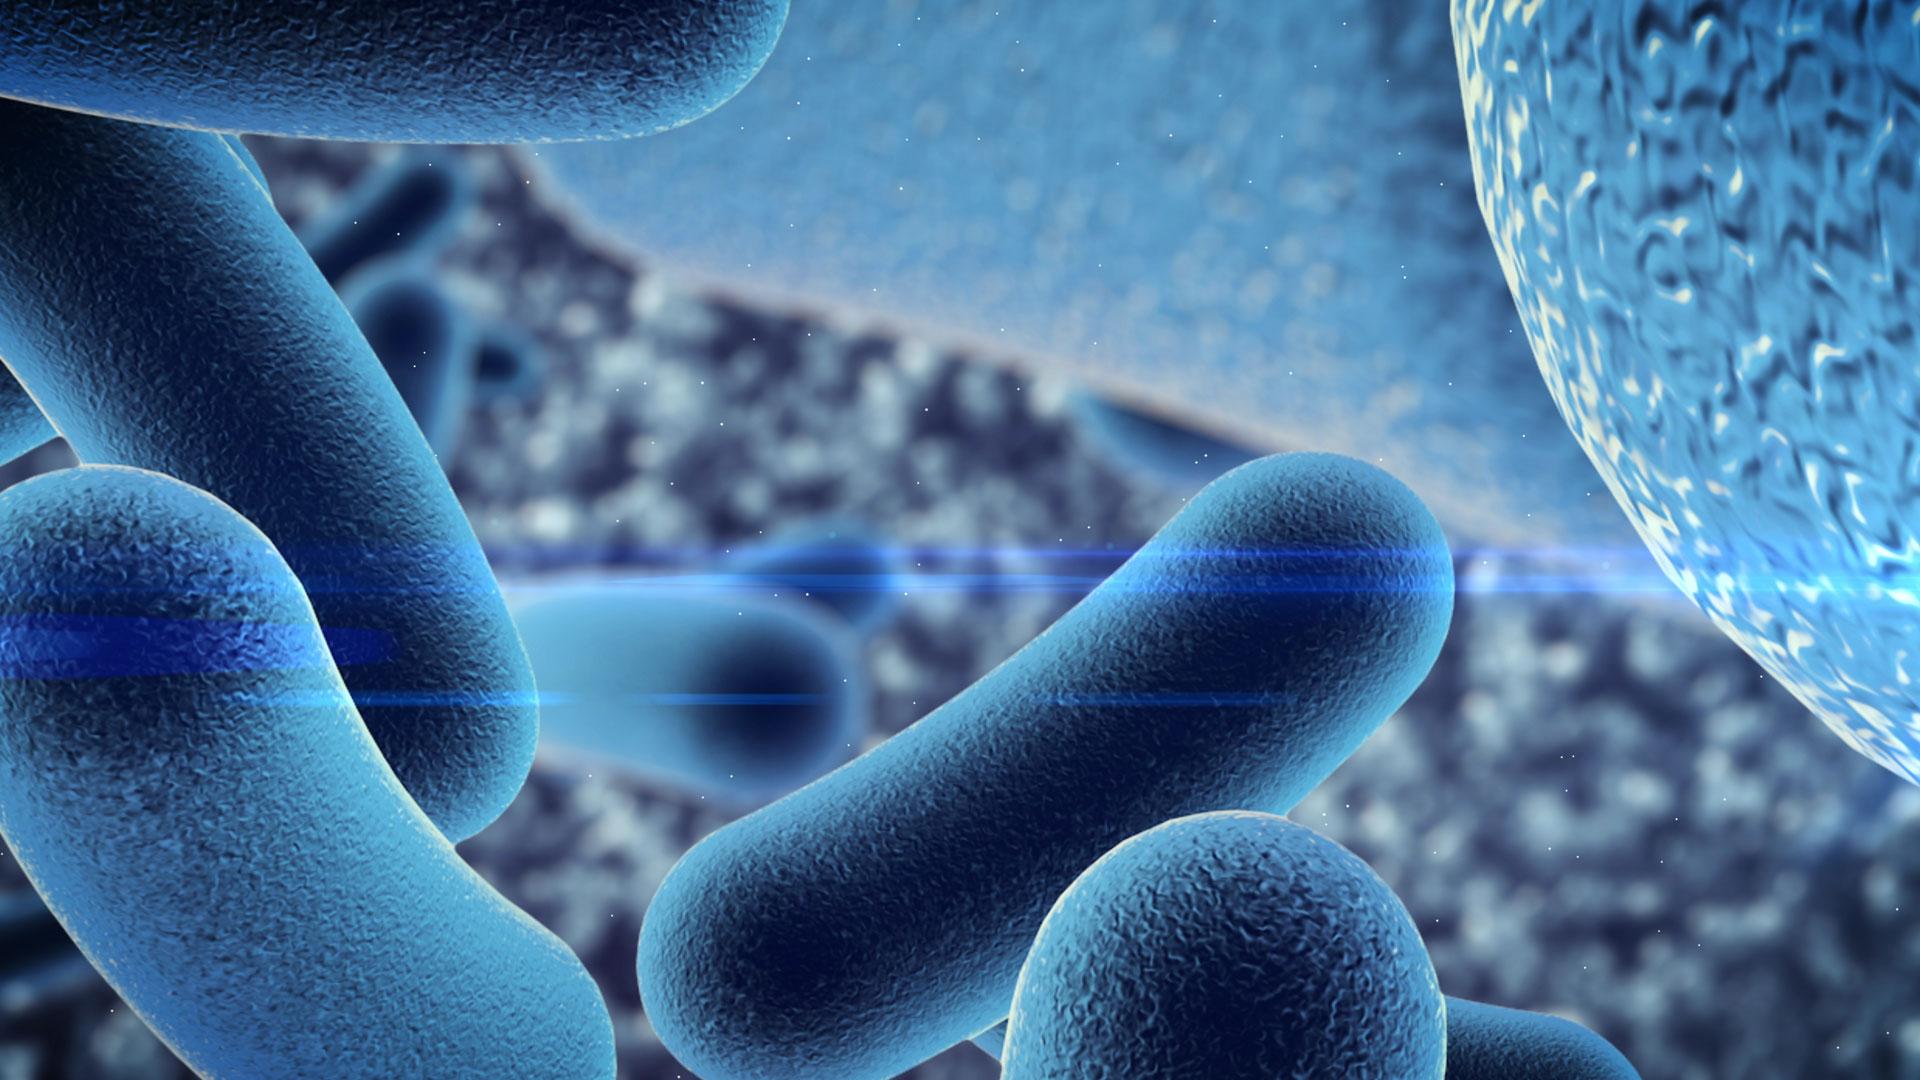 atmospheric bacteria